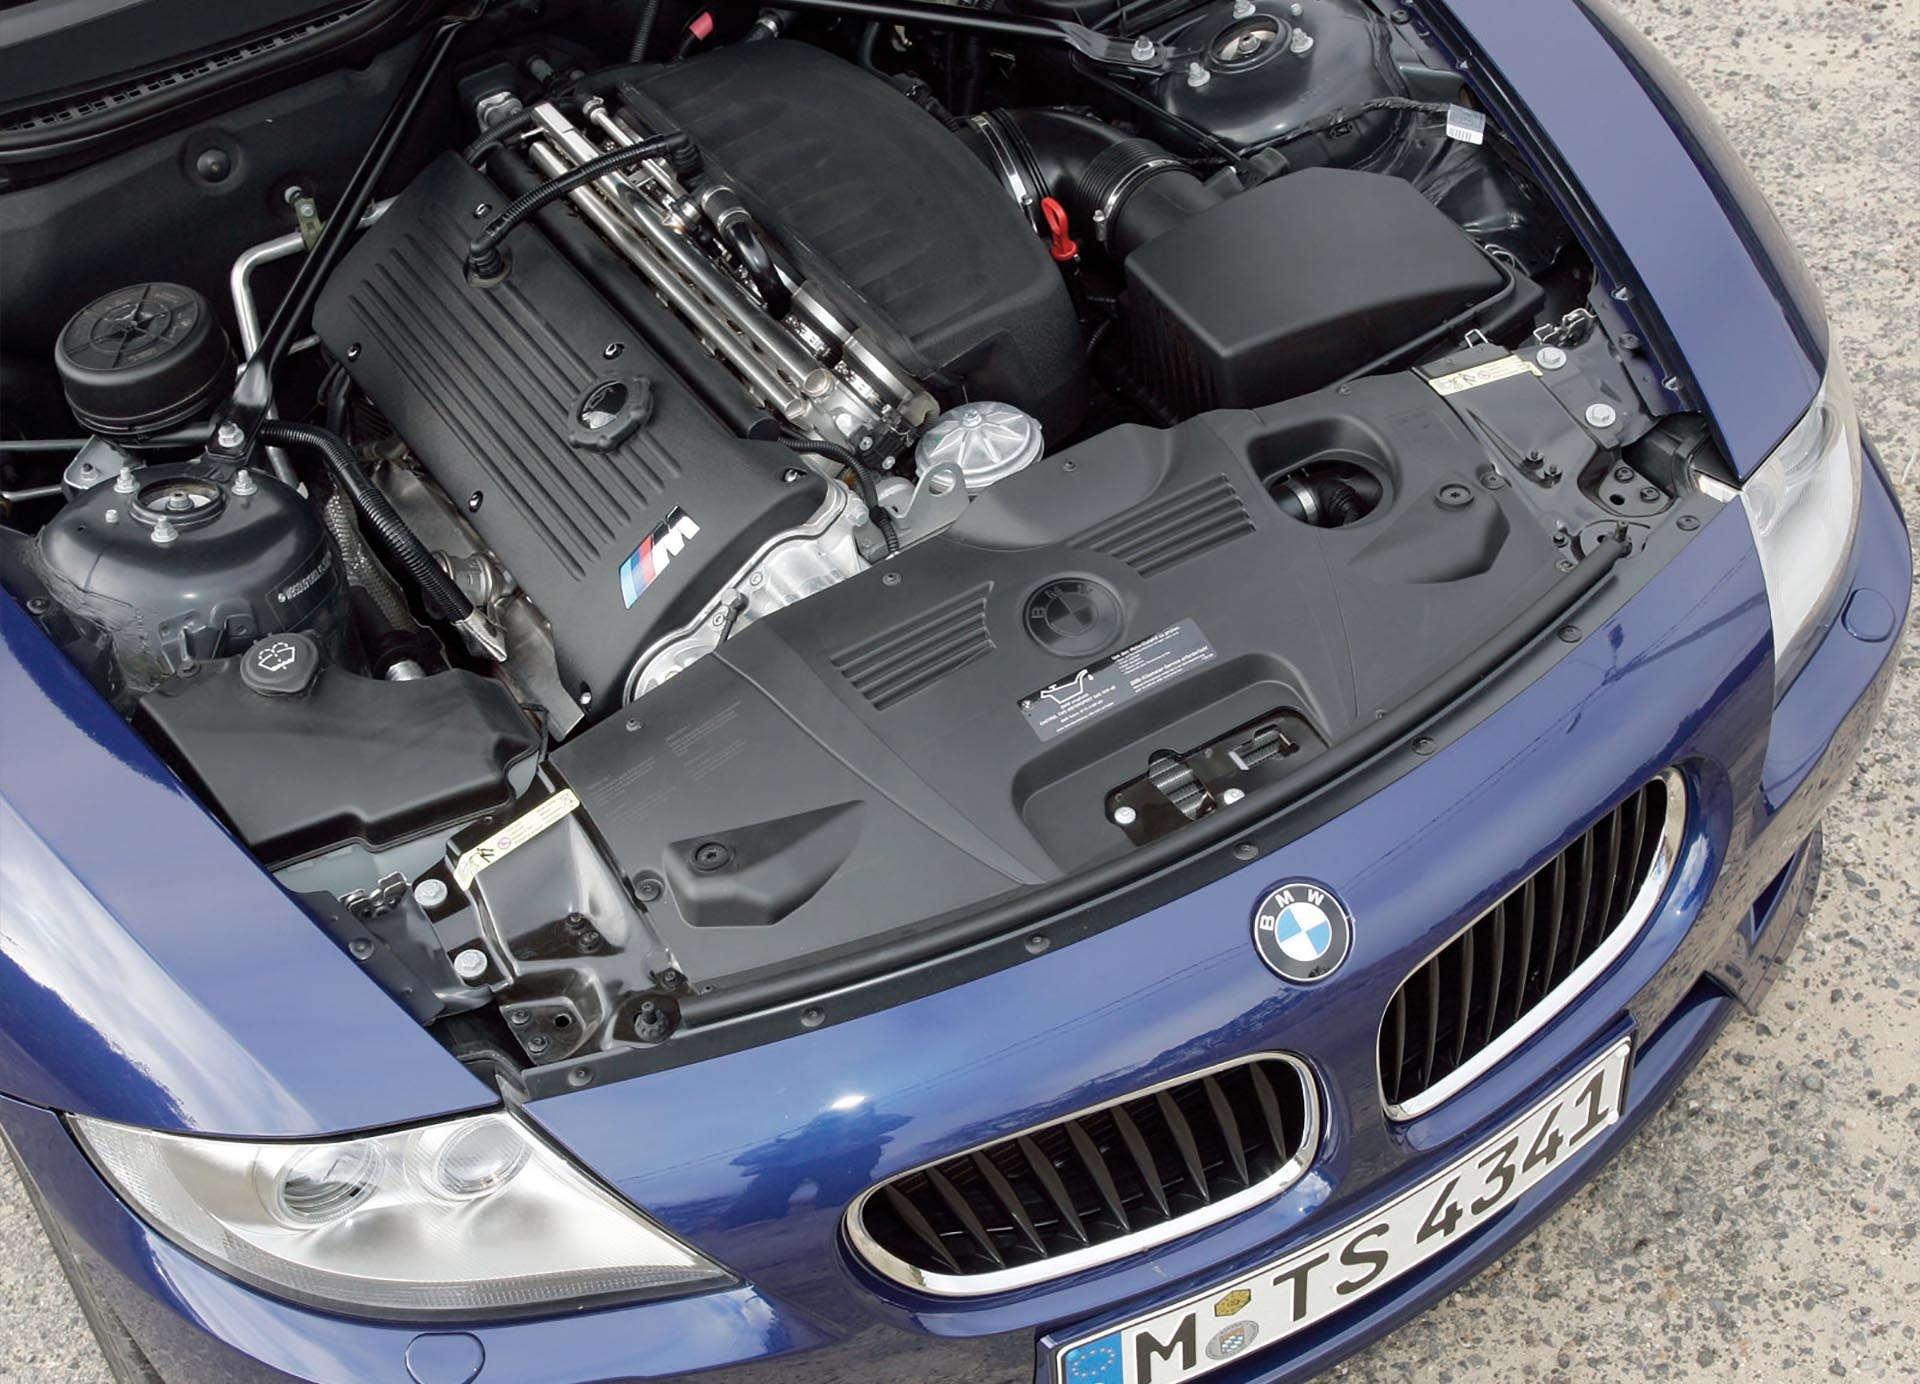 BMW Z4 M Coupe S54 engine